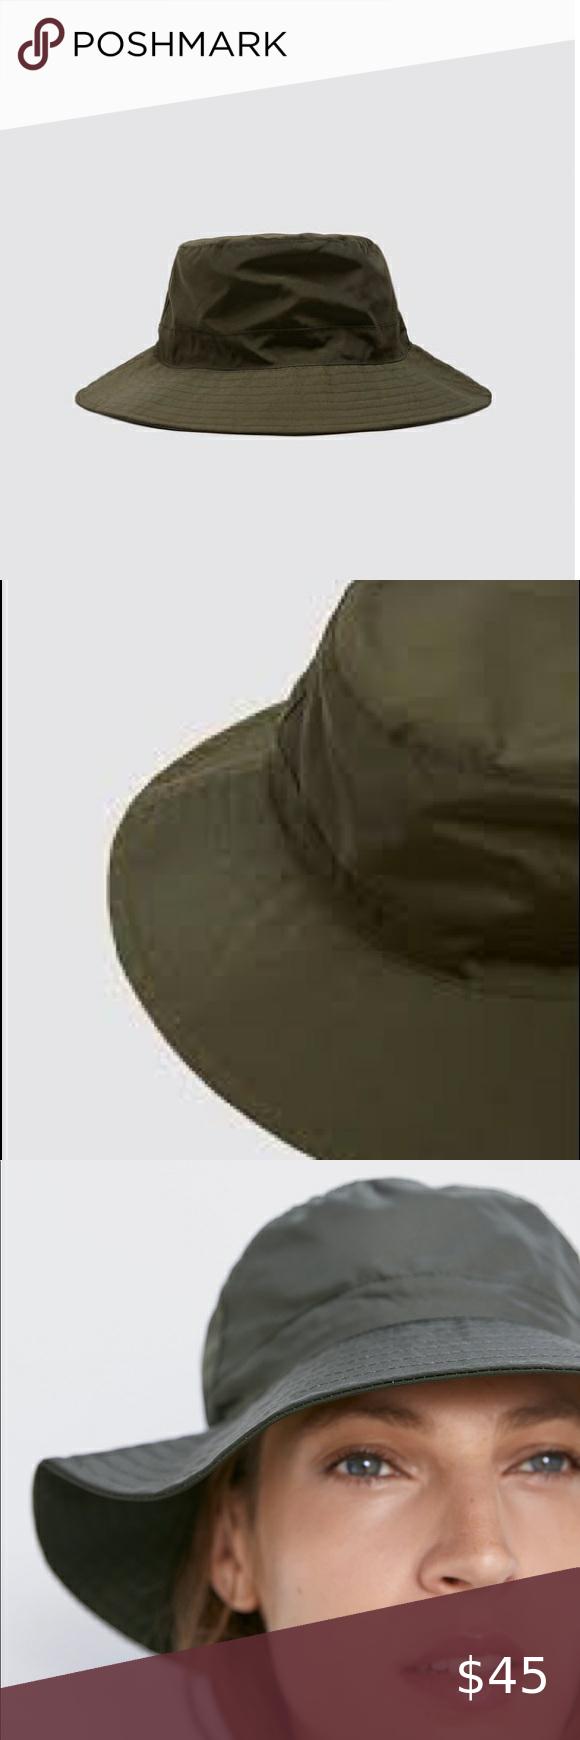 Zara Green Bucket Hat Zara Bucket Hat Women Accessories Hats